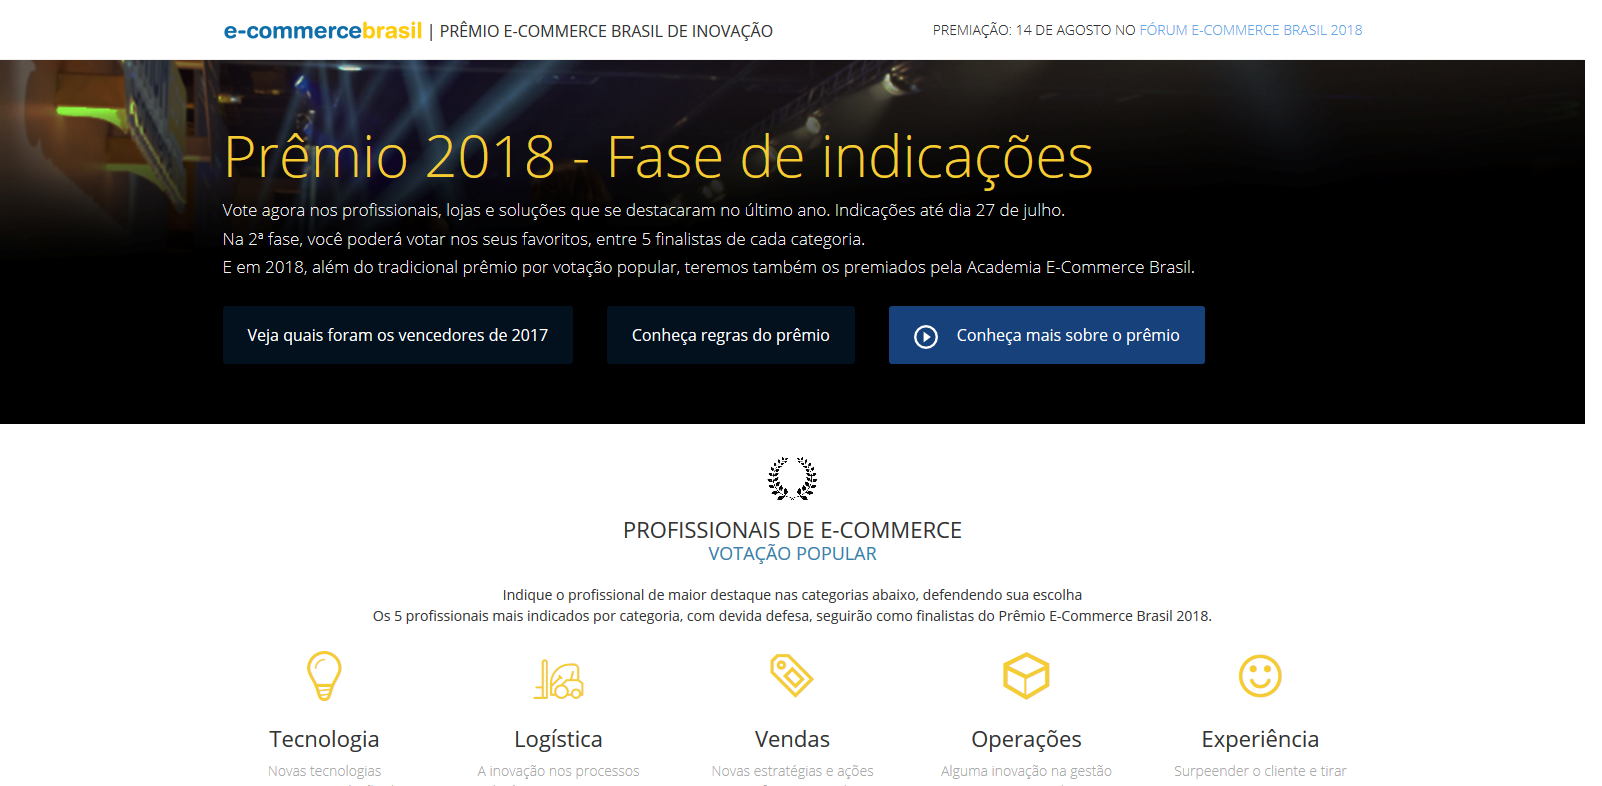 Acesse o site www.premioecommercebrasil.com.br